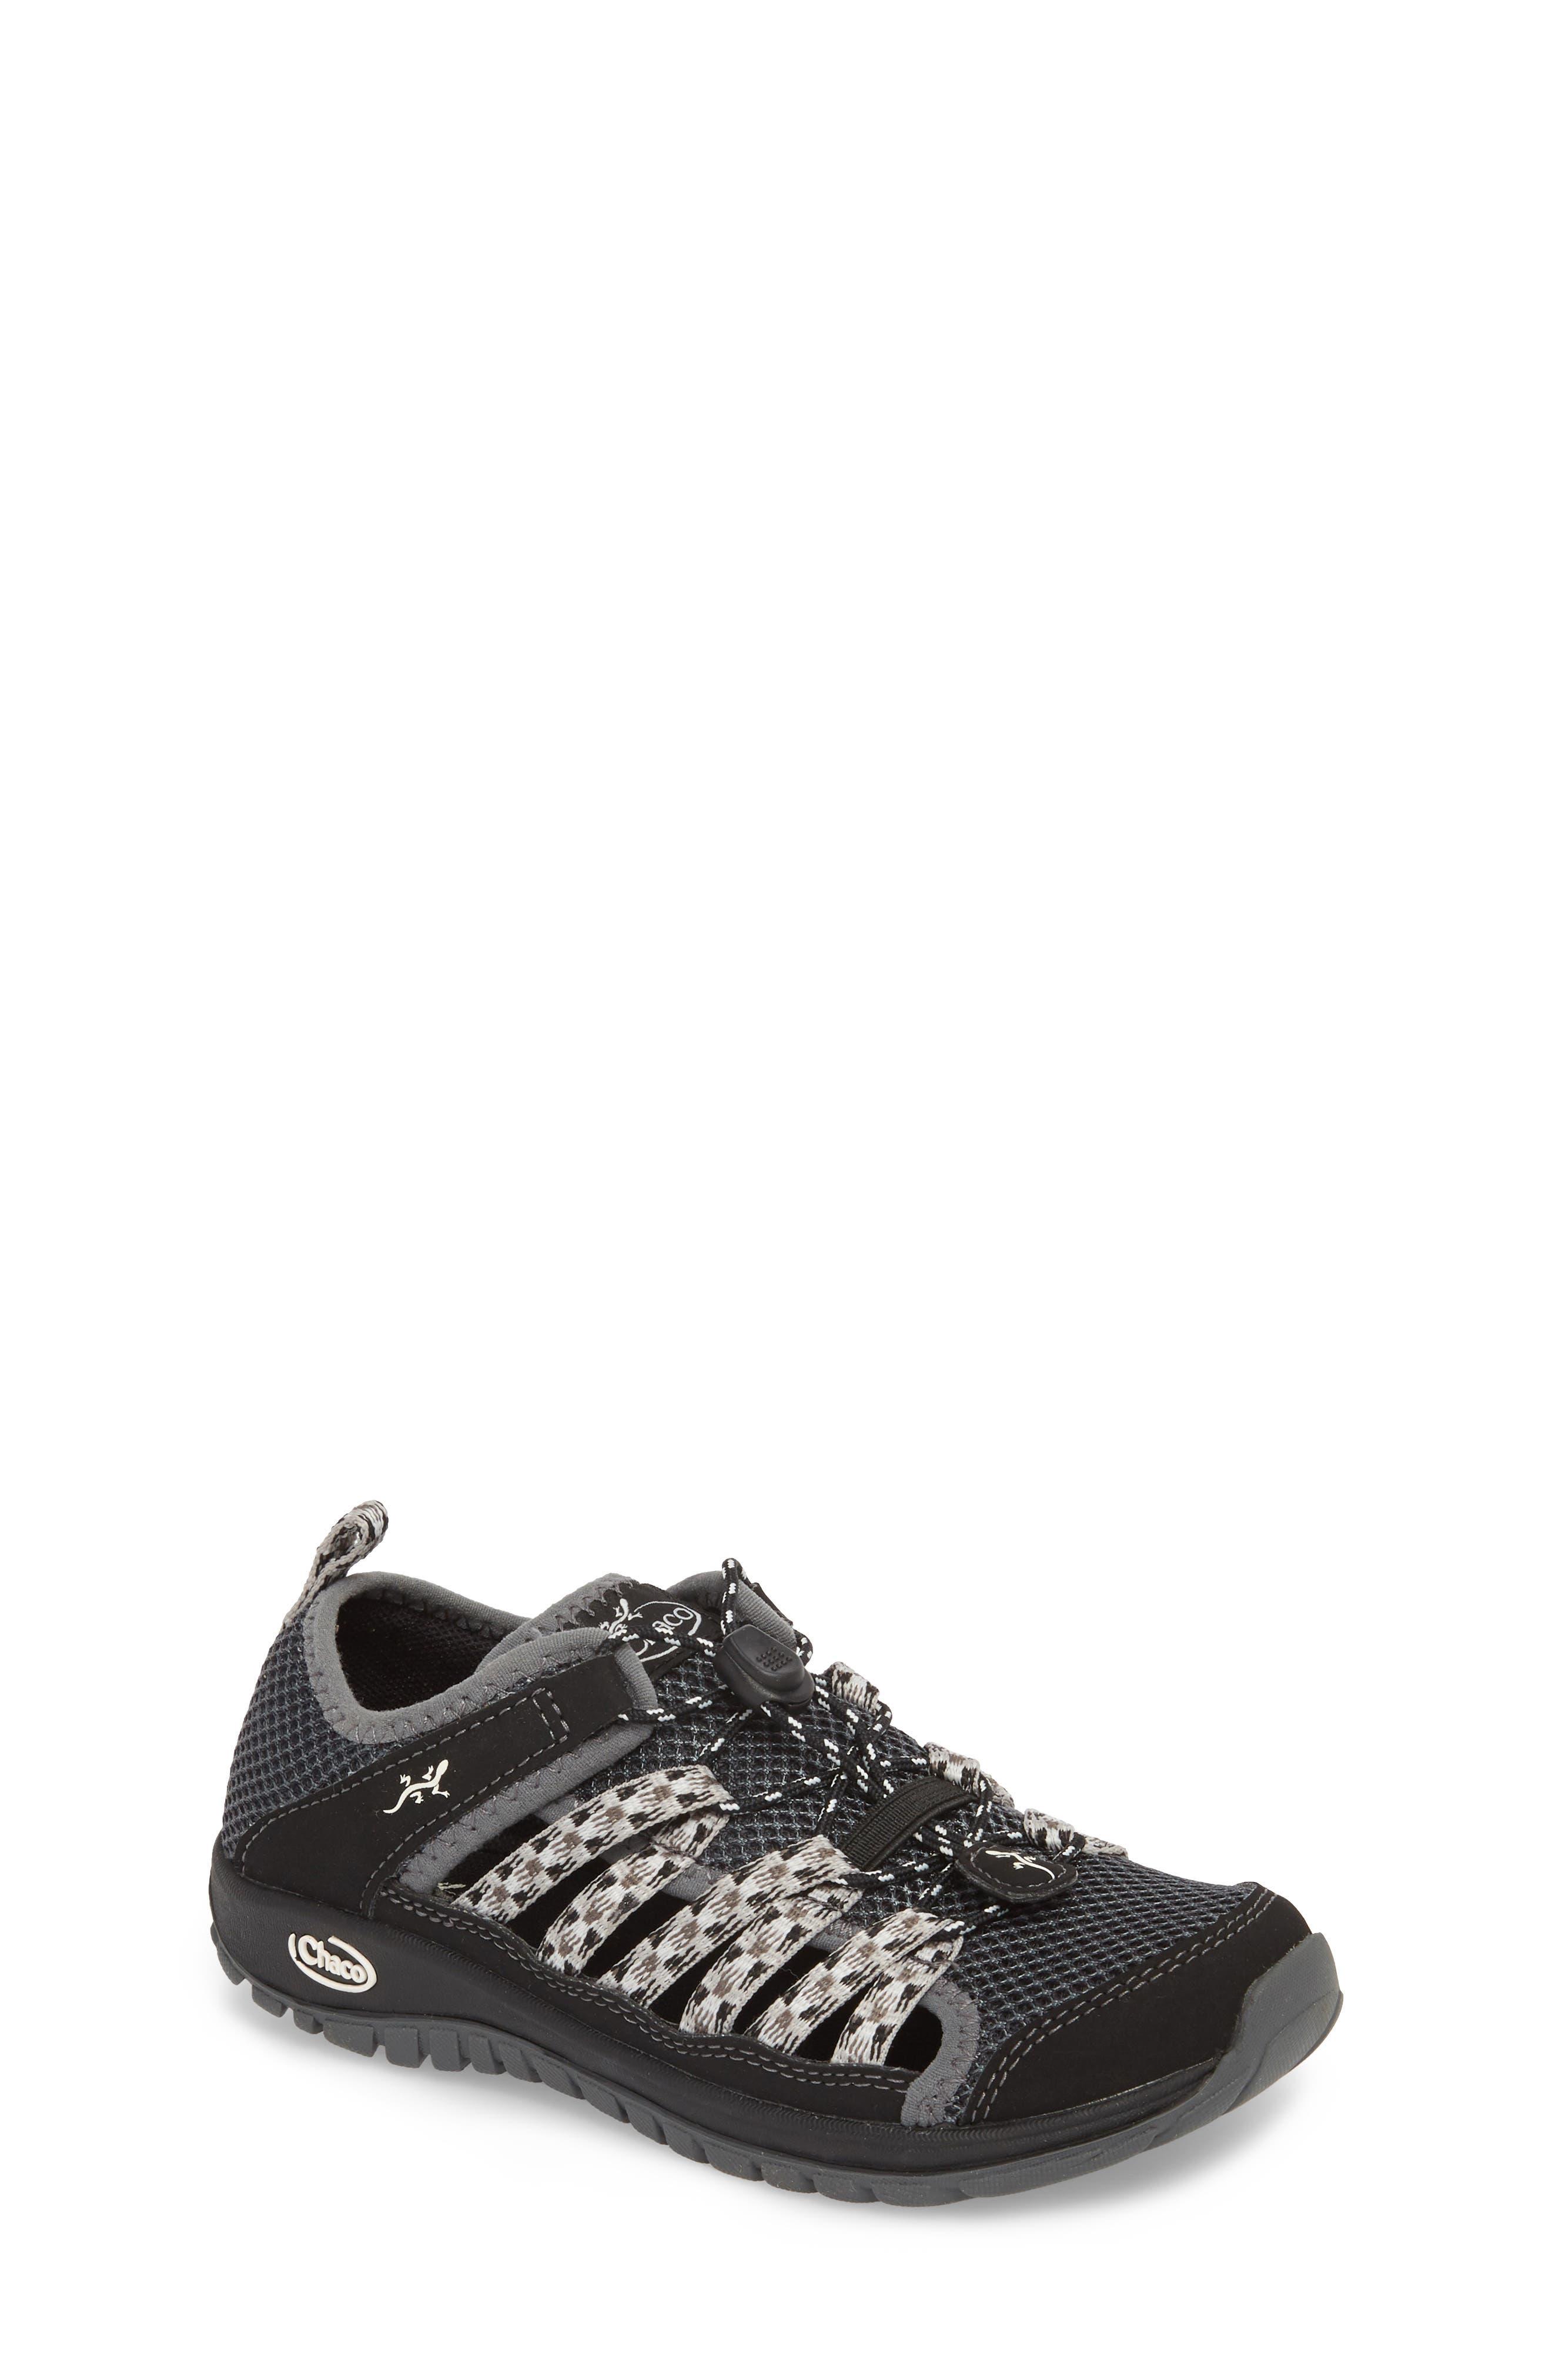 Outcross 2 Water Sneaker,                             Main thumbnail 1, color,                             BLACK